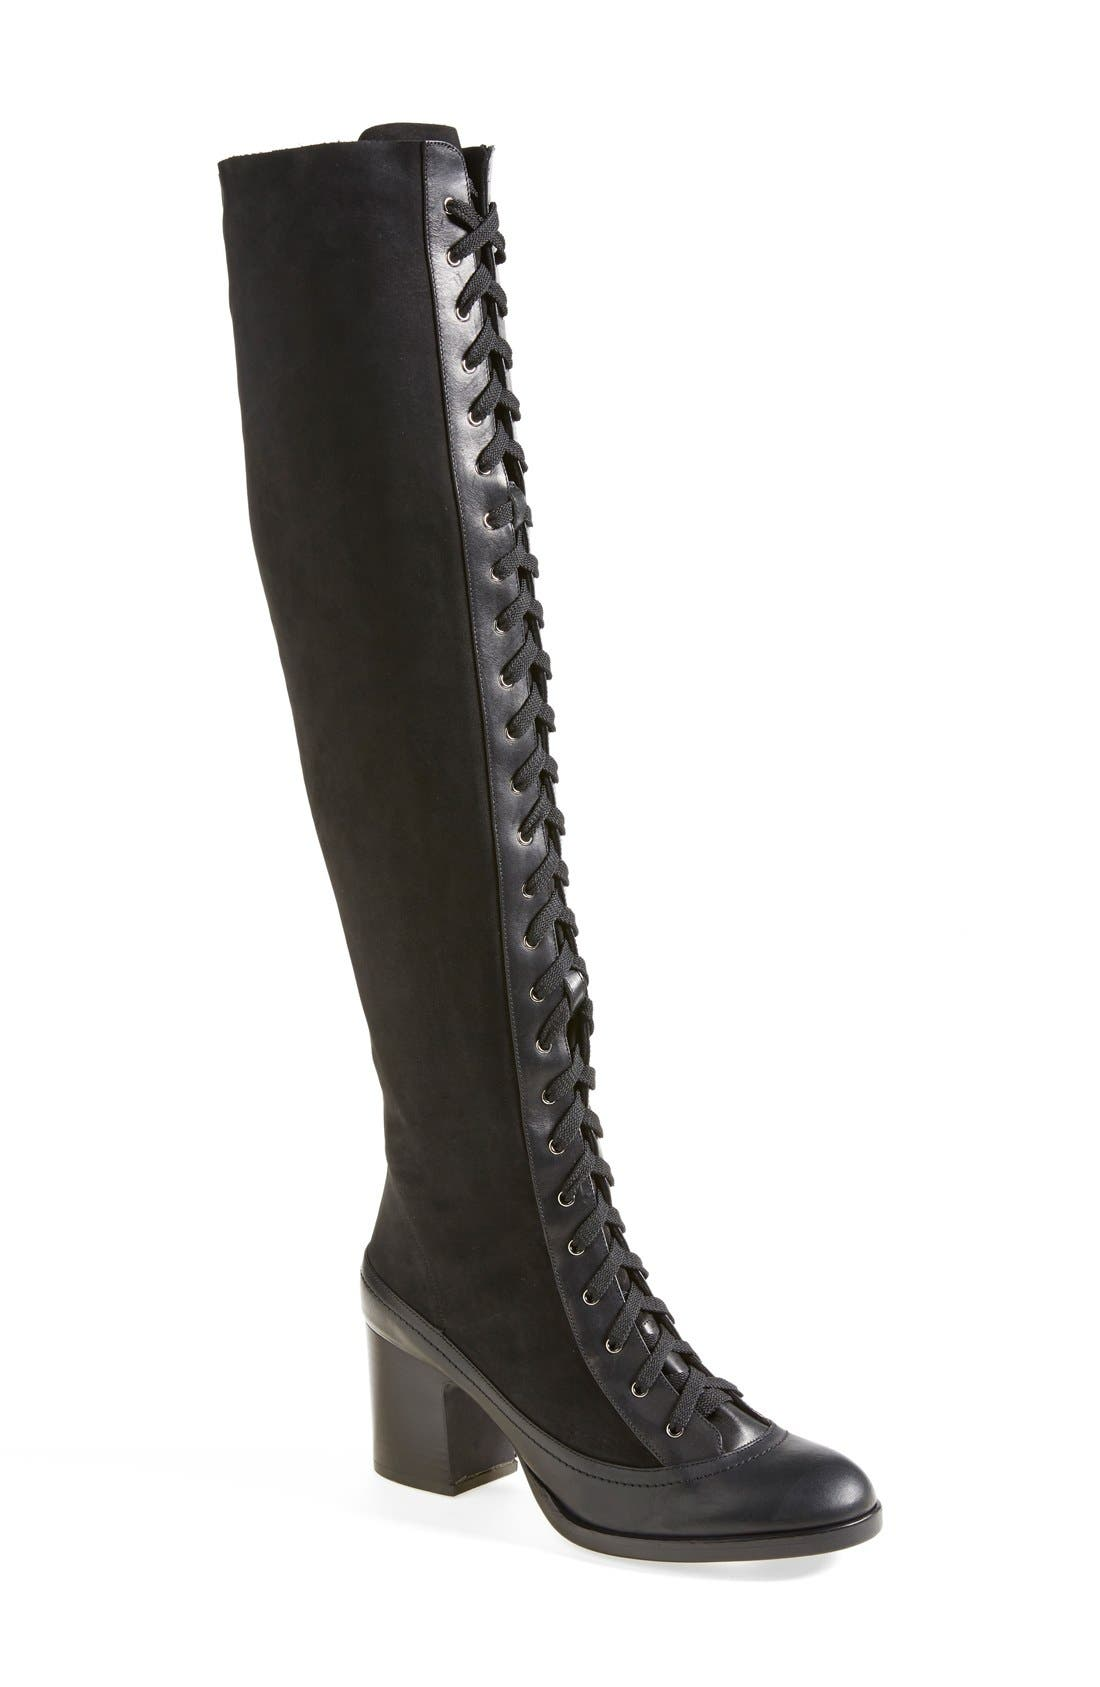 Alternate Image 1 Selected - Rag & Bone 'Acton' Knee High Boot (Women)